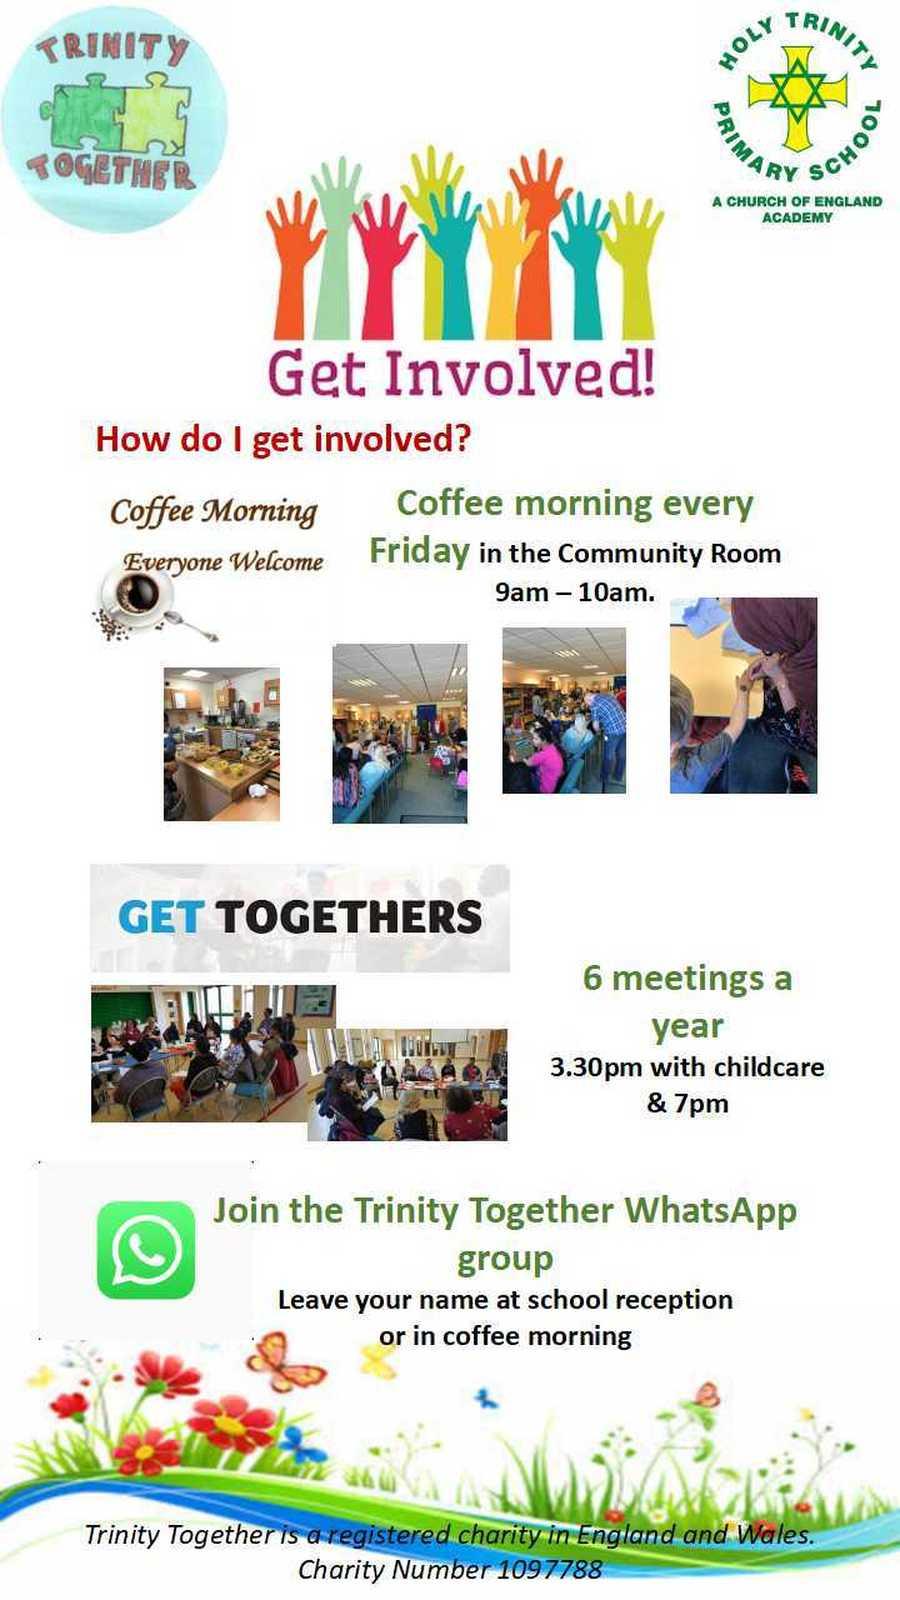 Holy Trinity Primary School - Trinity Together